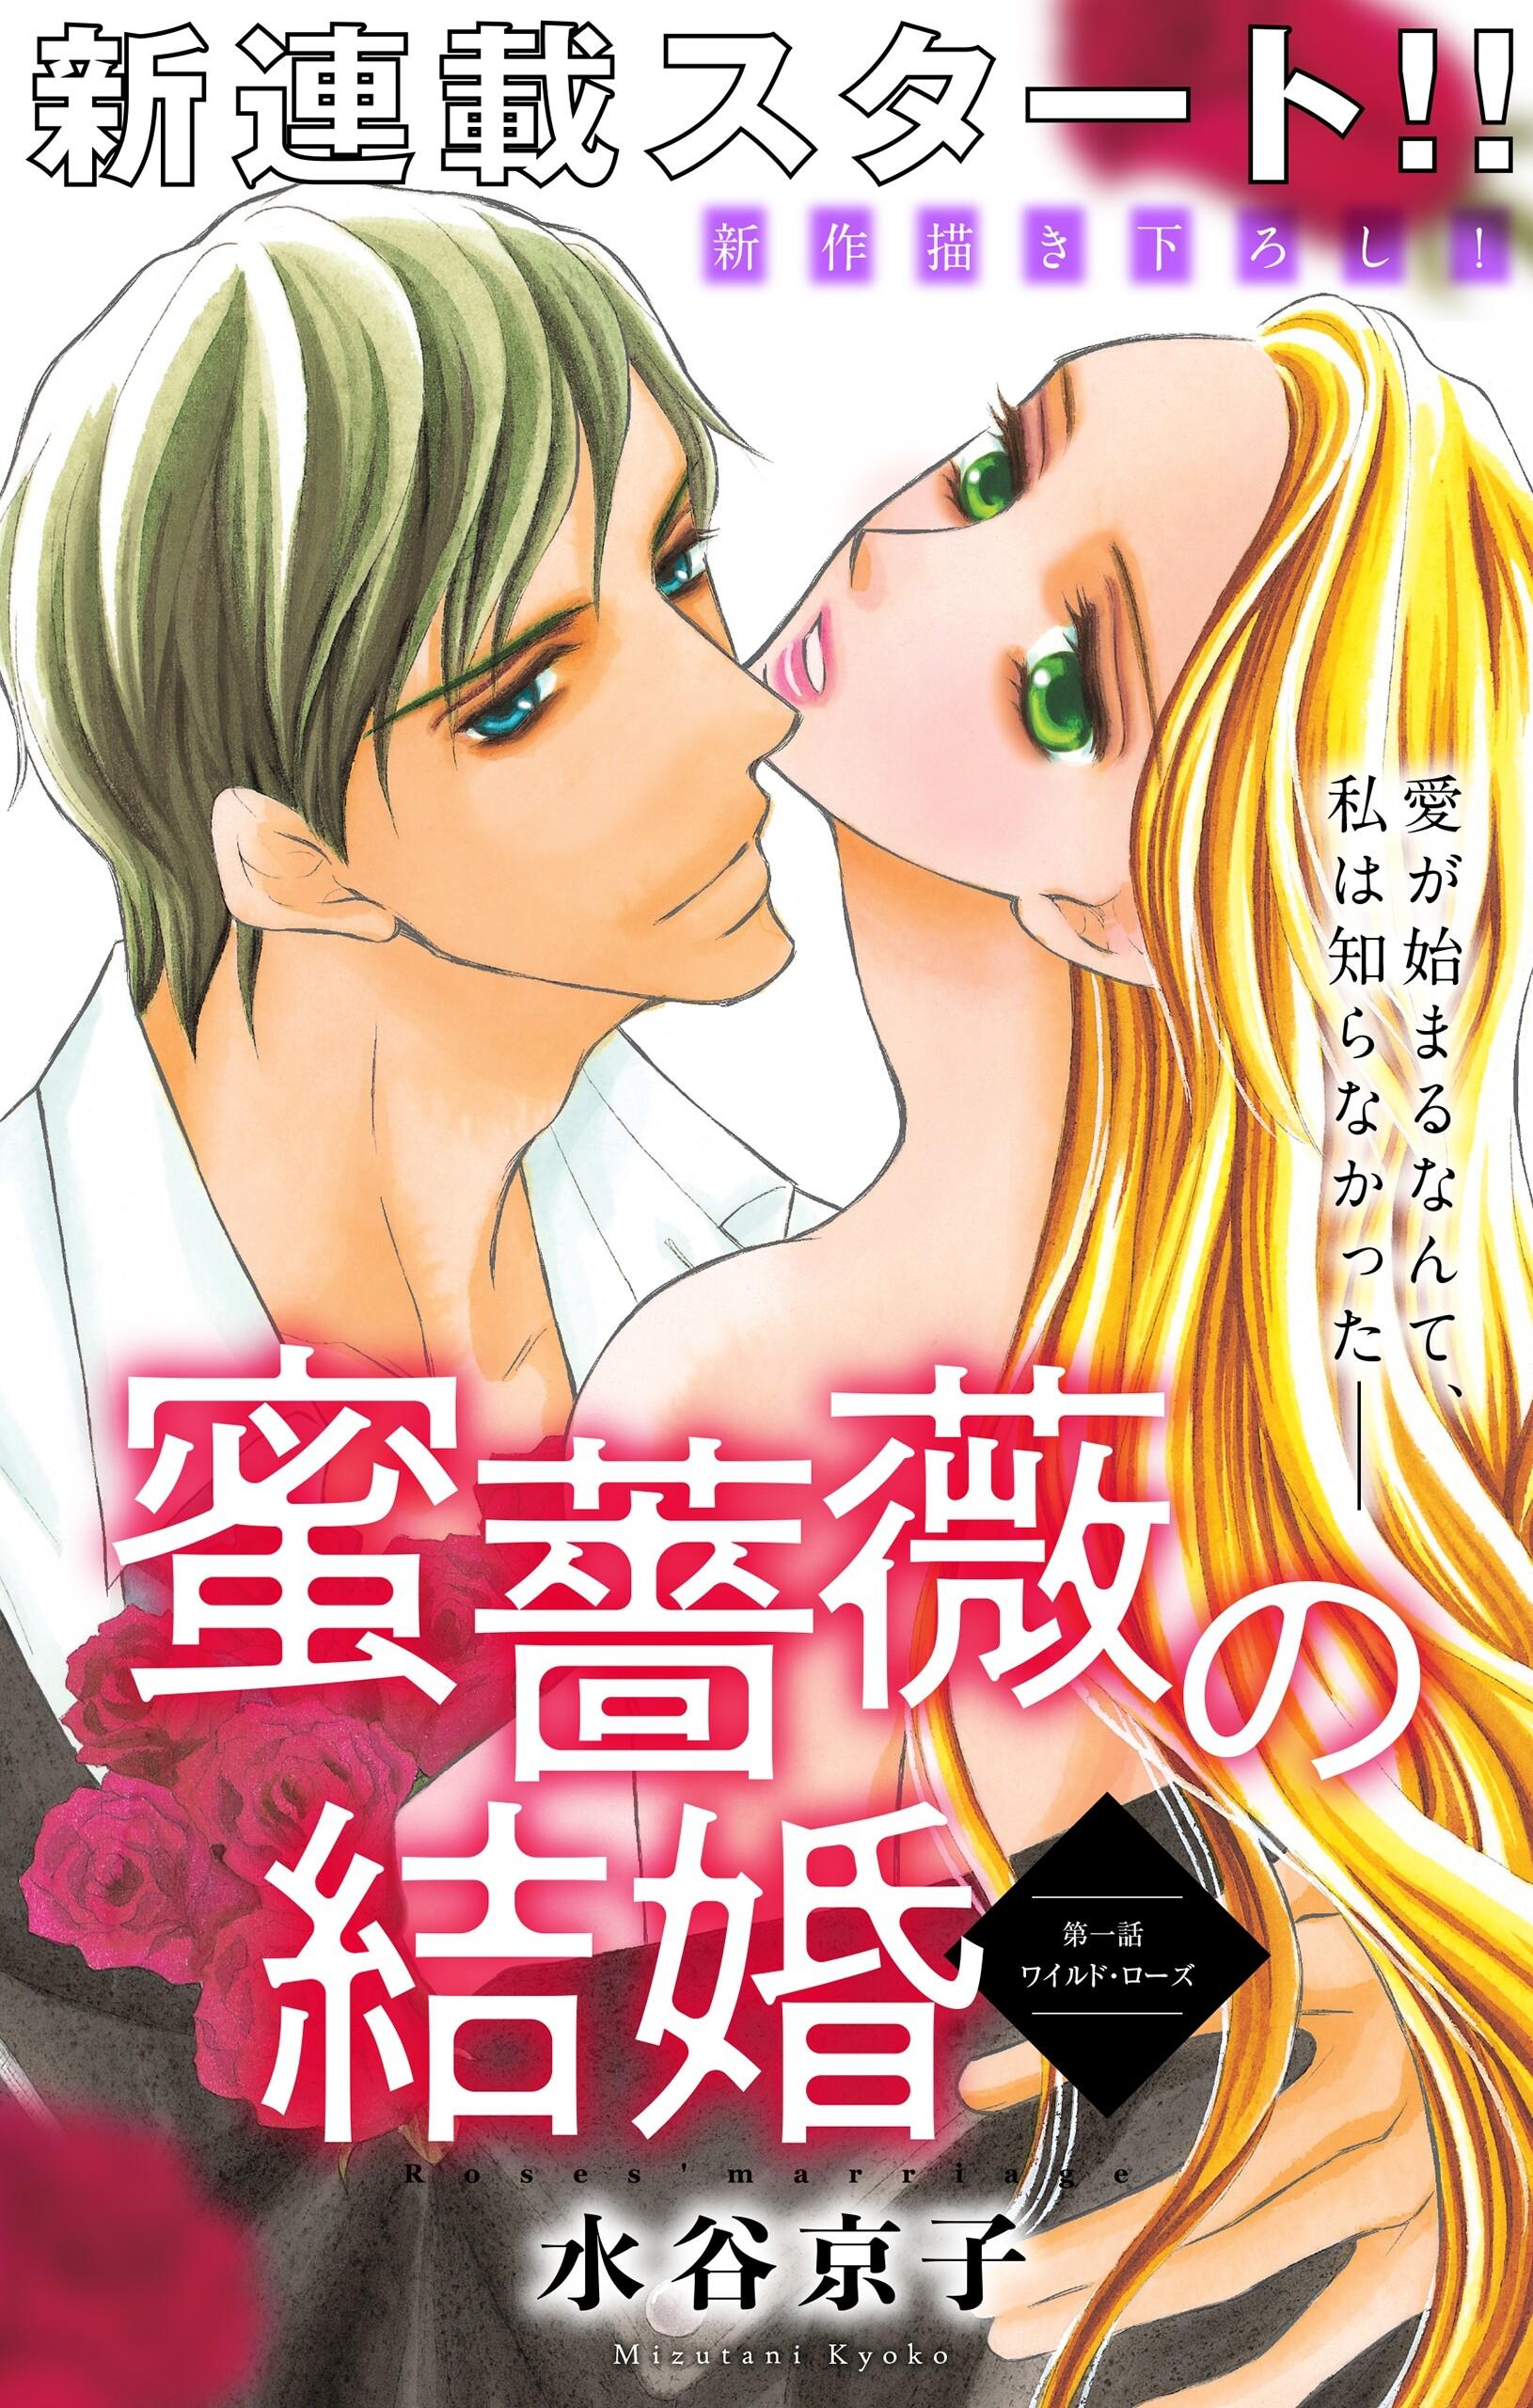 Love Silky 蜜薔薇の結婚 story01